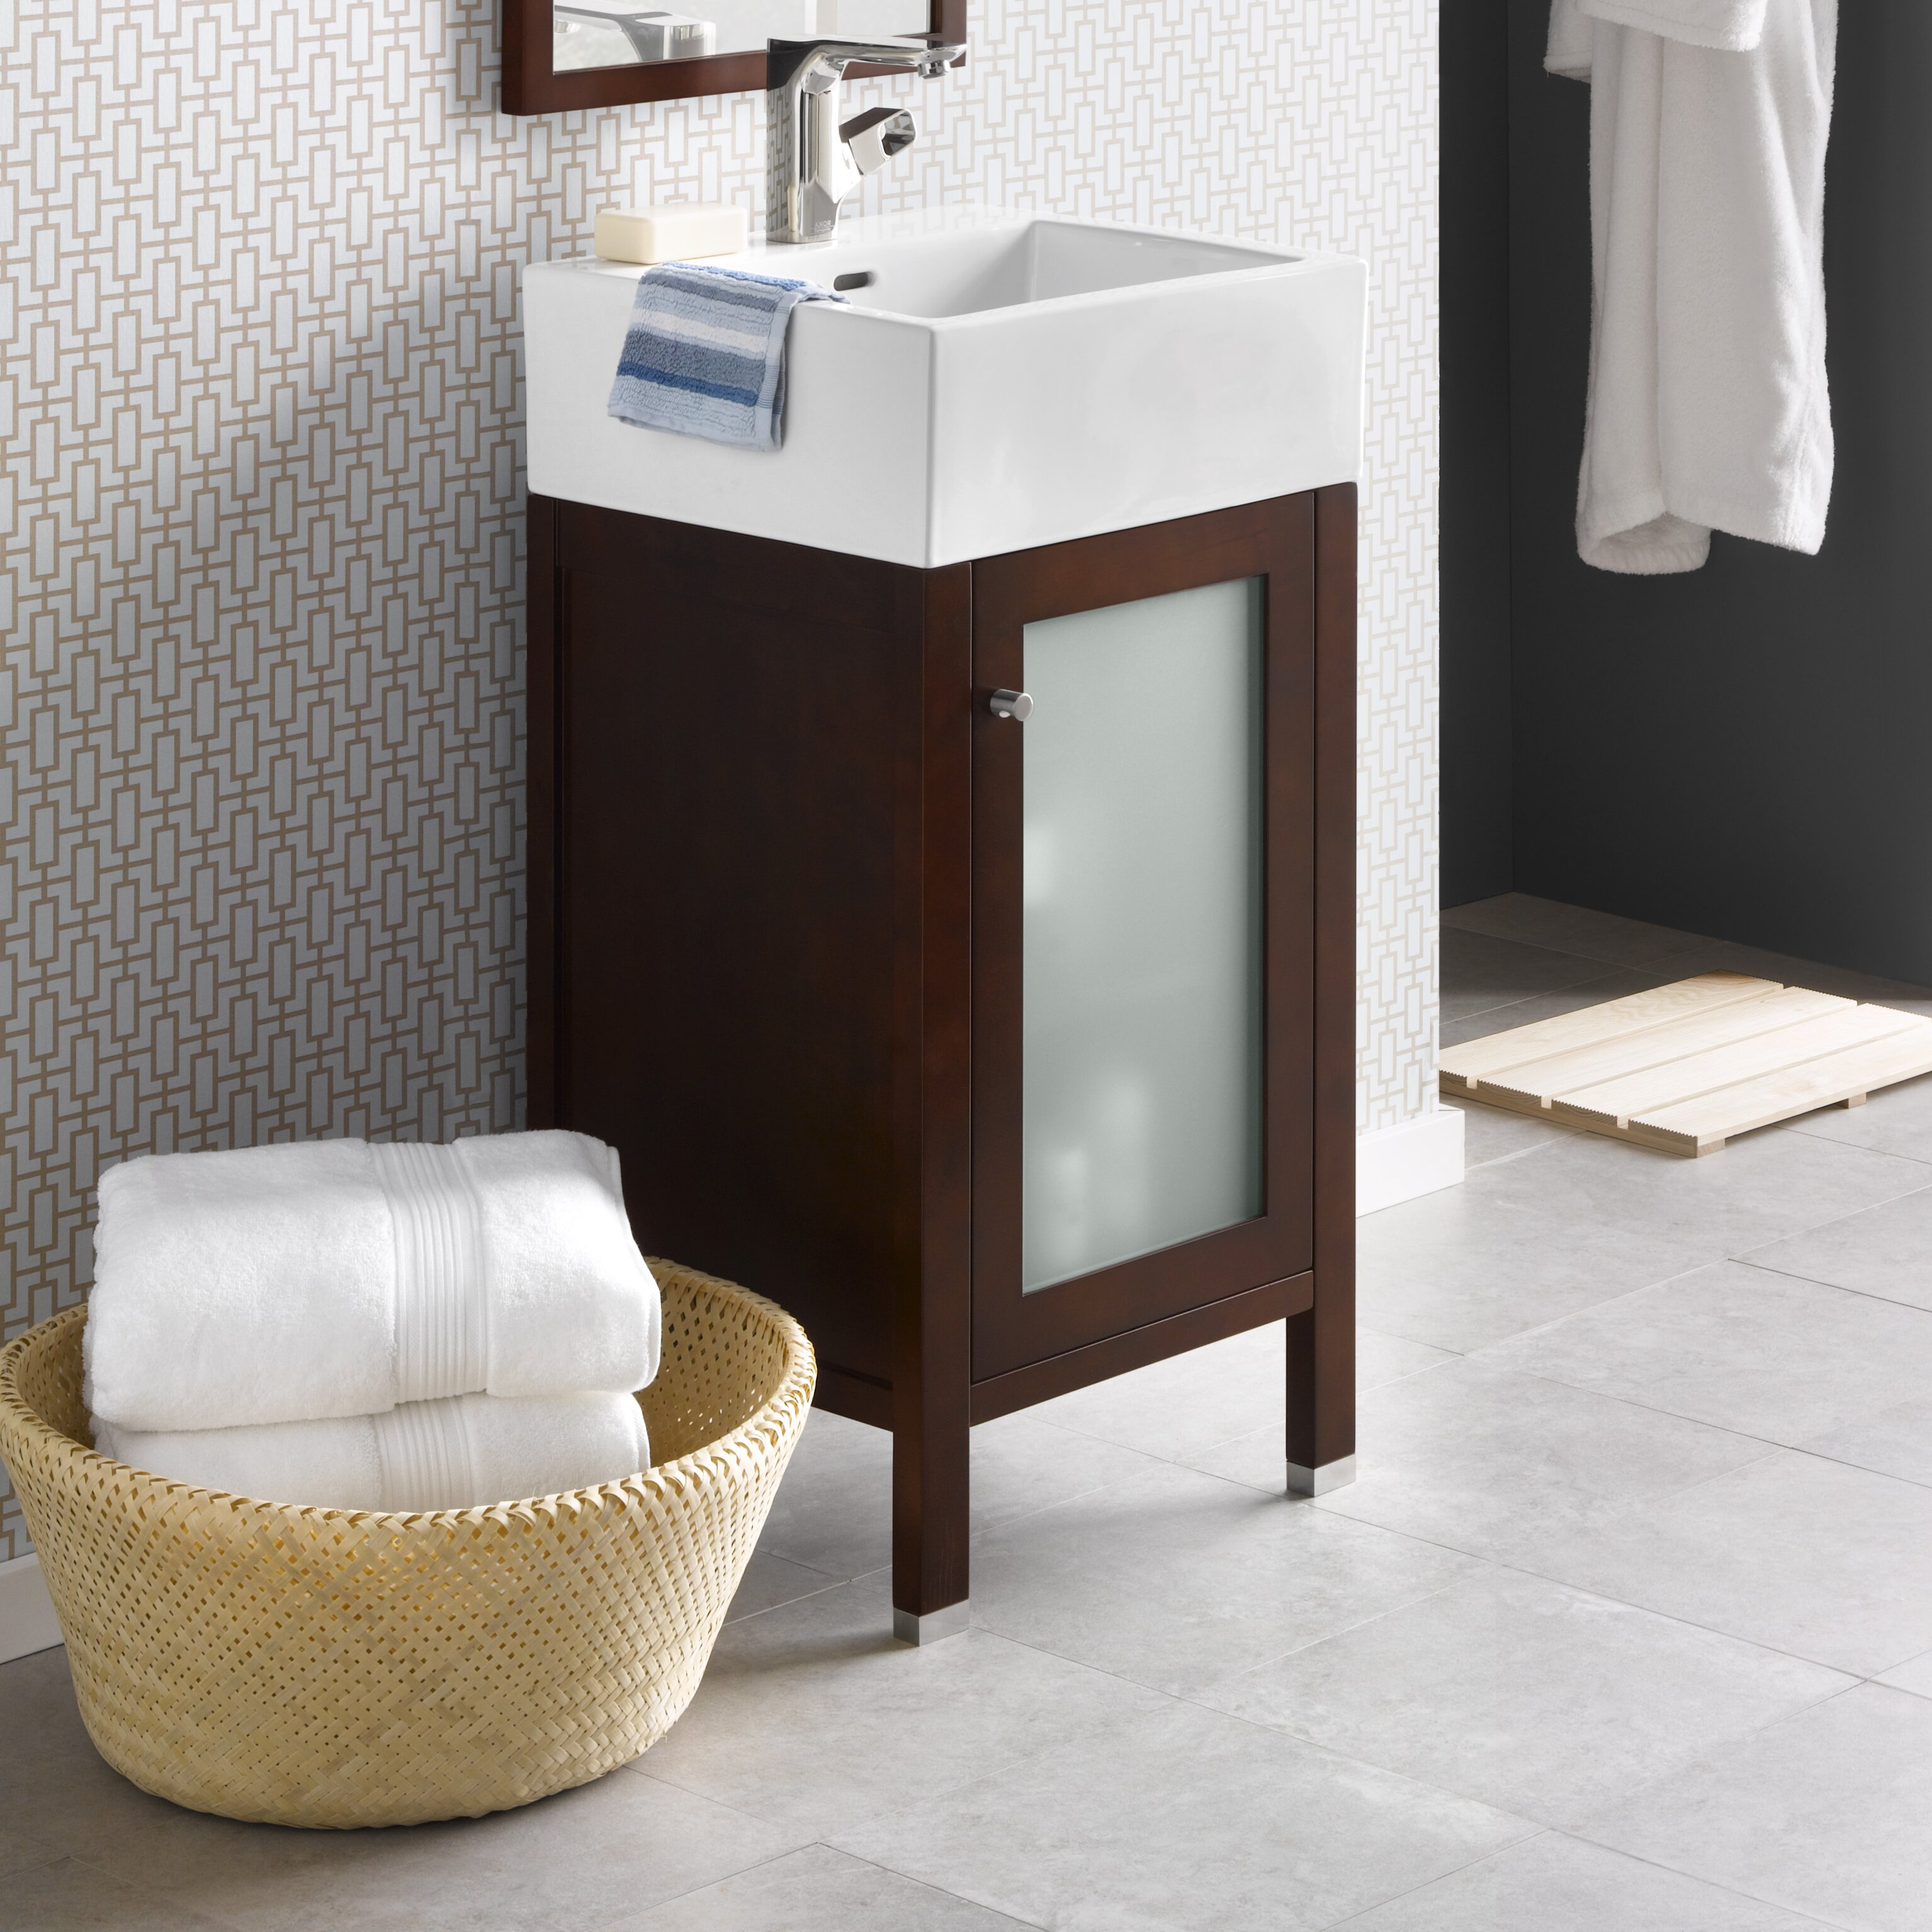 Ronbow Cami 18 quot  Single Bathroom Vanity Set. Ronbow Cami 18  Single Bathroom Vanity Set   Reviews   Wayfair